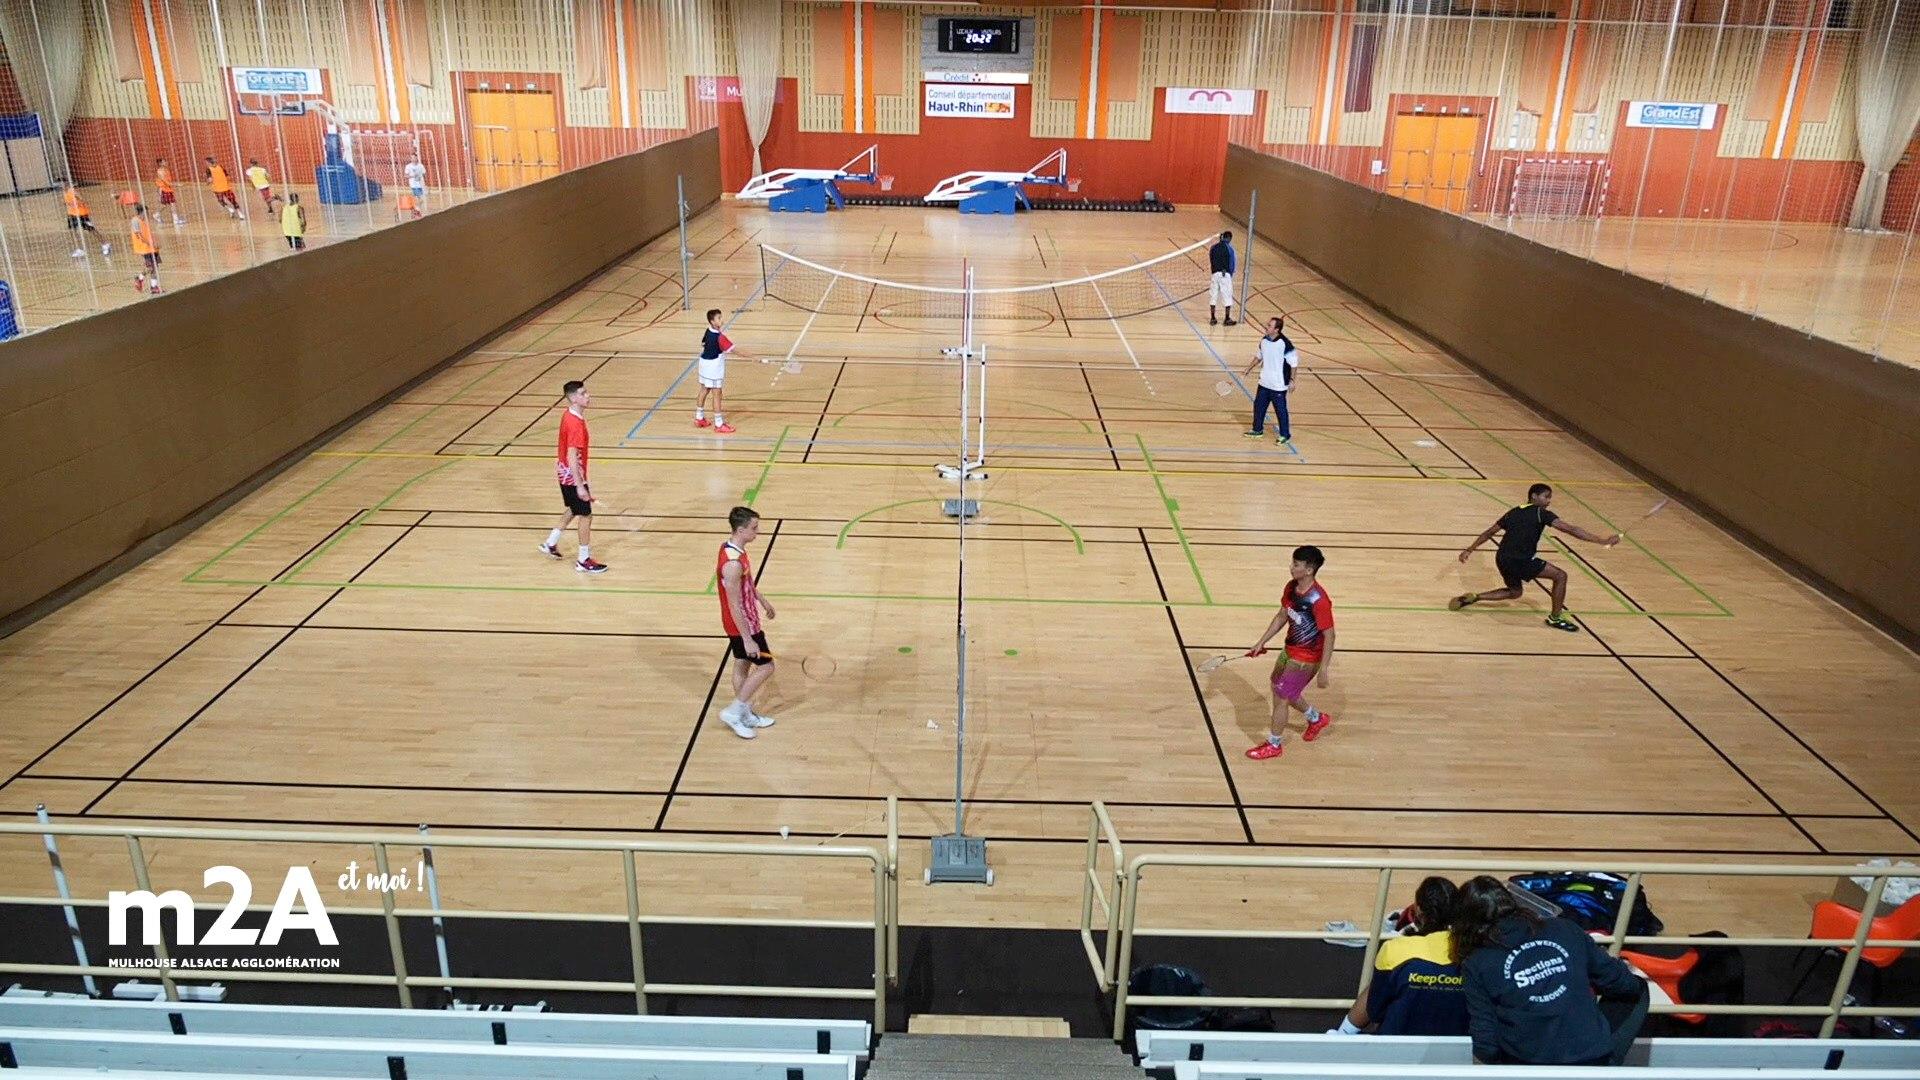 webserie-staffelfelden-Centre-sportif-regional-Alsace-entrainement-elites